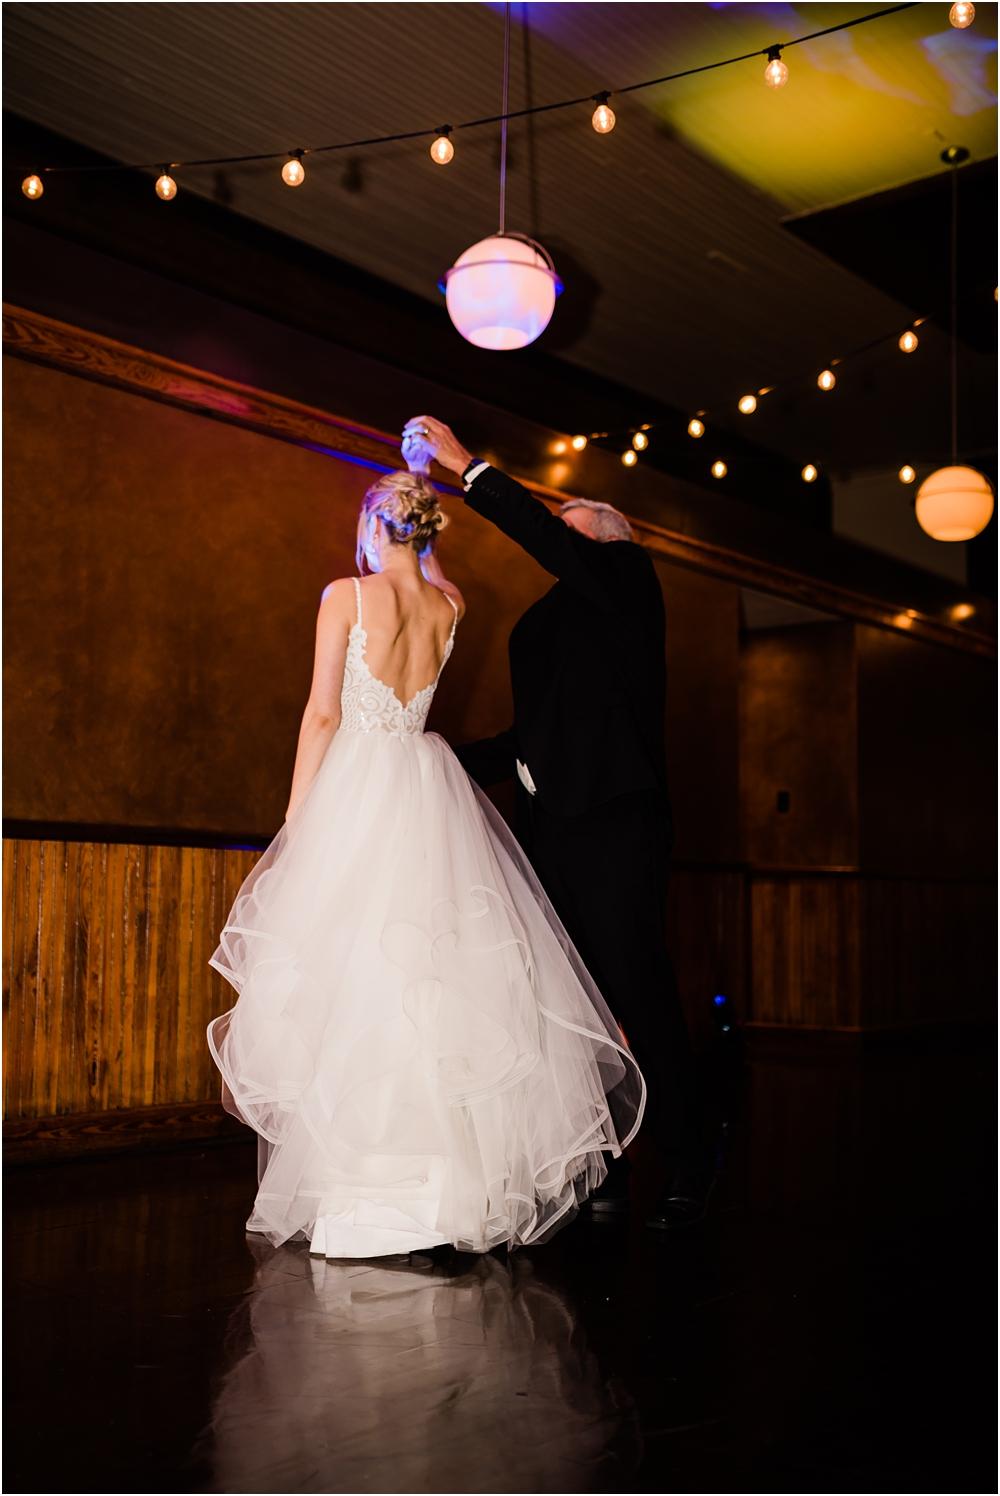 oconnor-pensacola-florida-wedding-photographer-kiersten-taylor-134.jpg